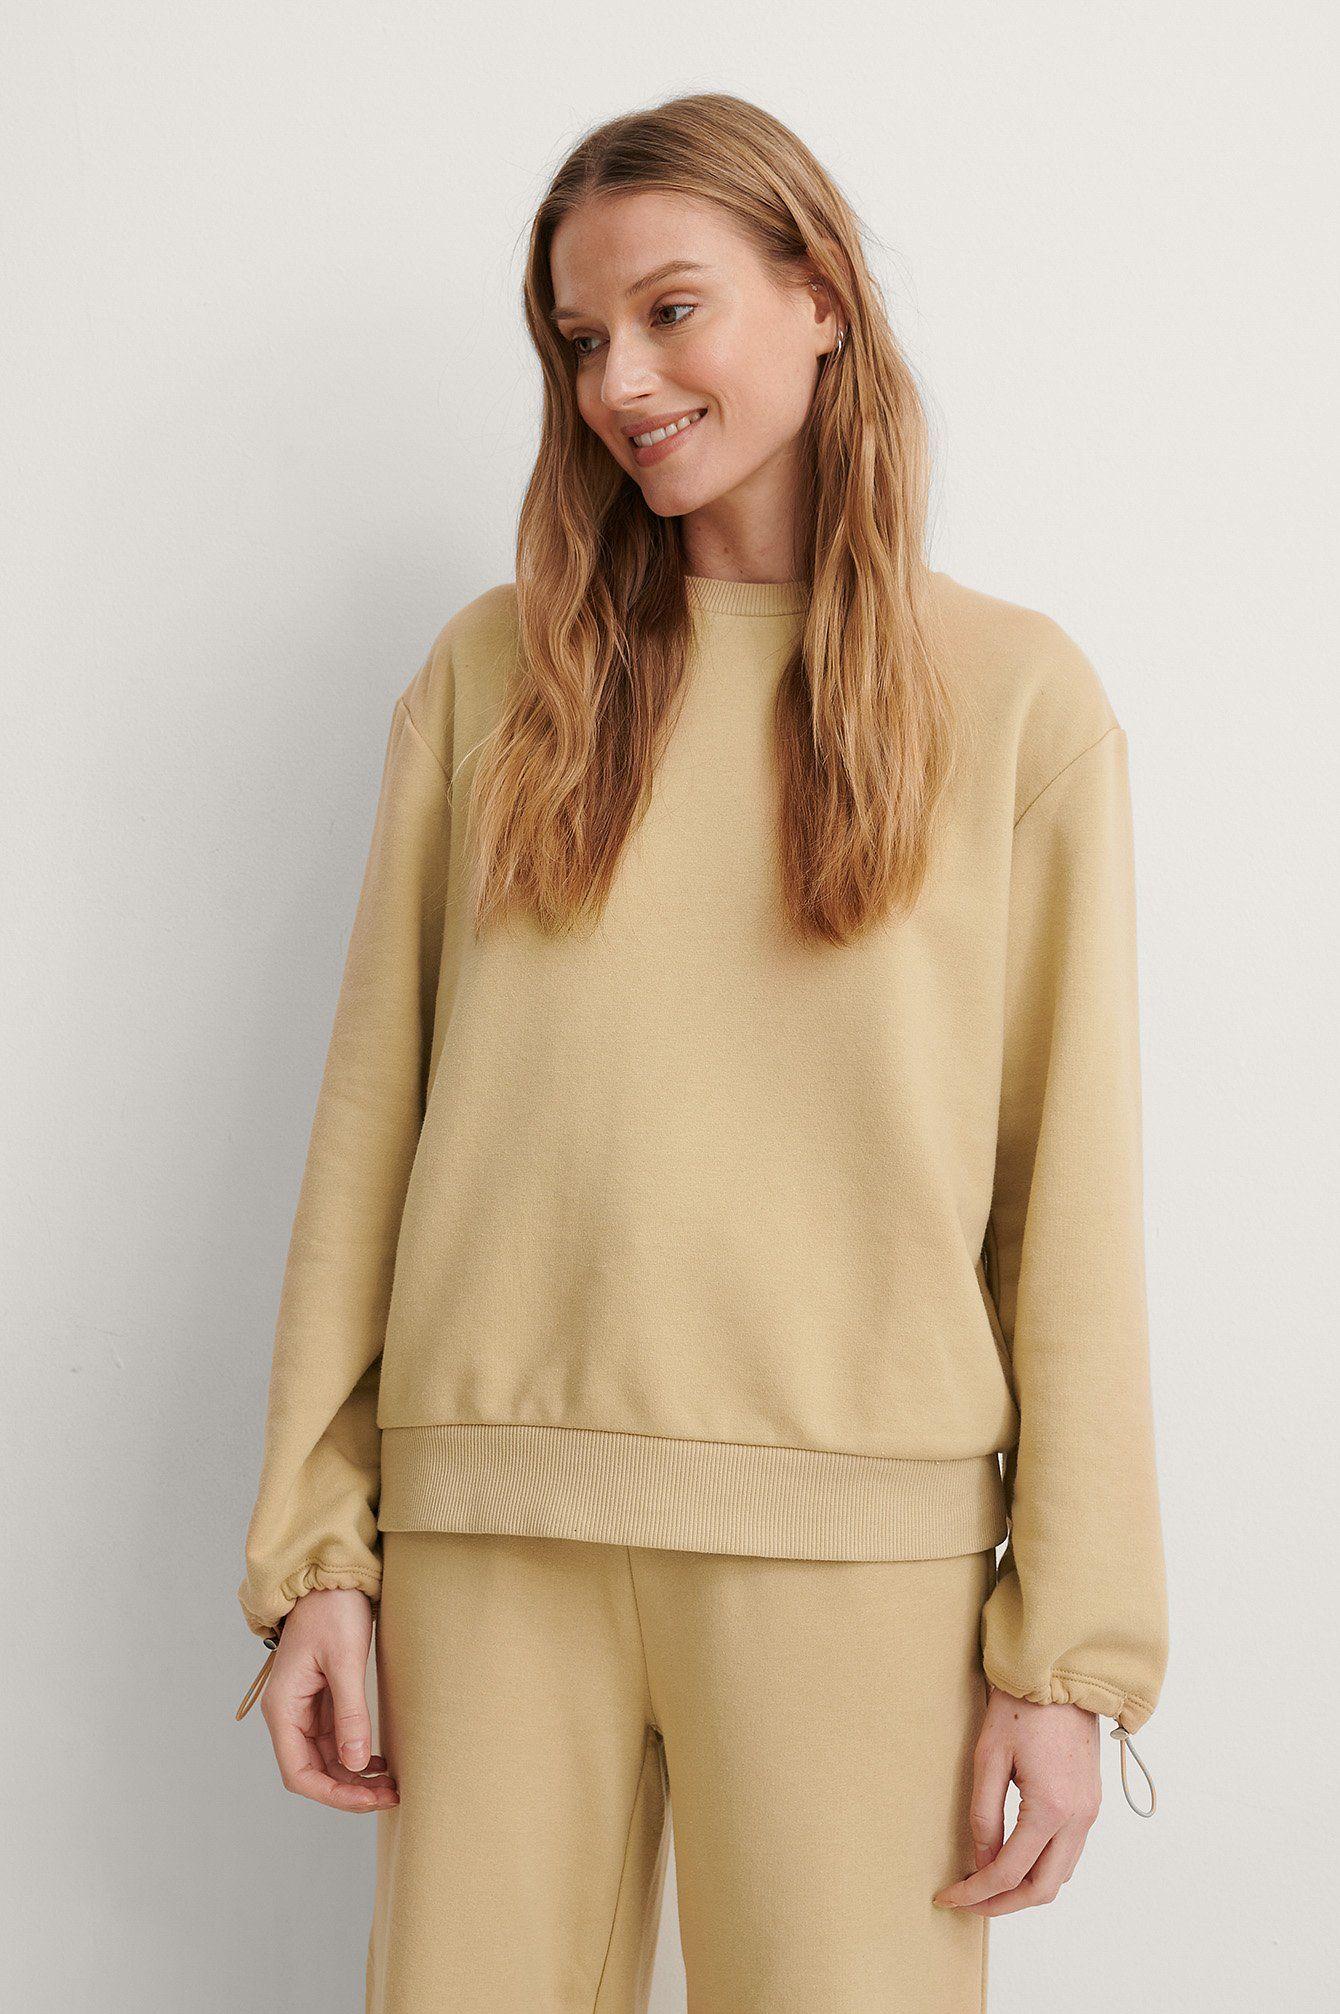 NA-KD Sweatshirt, beige, x-large